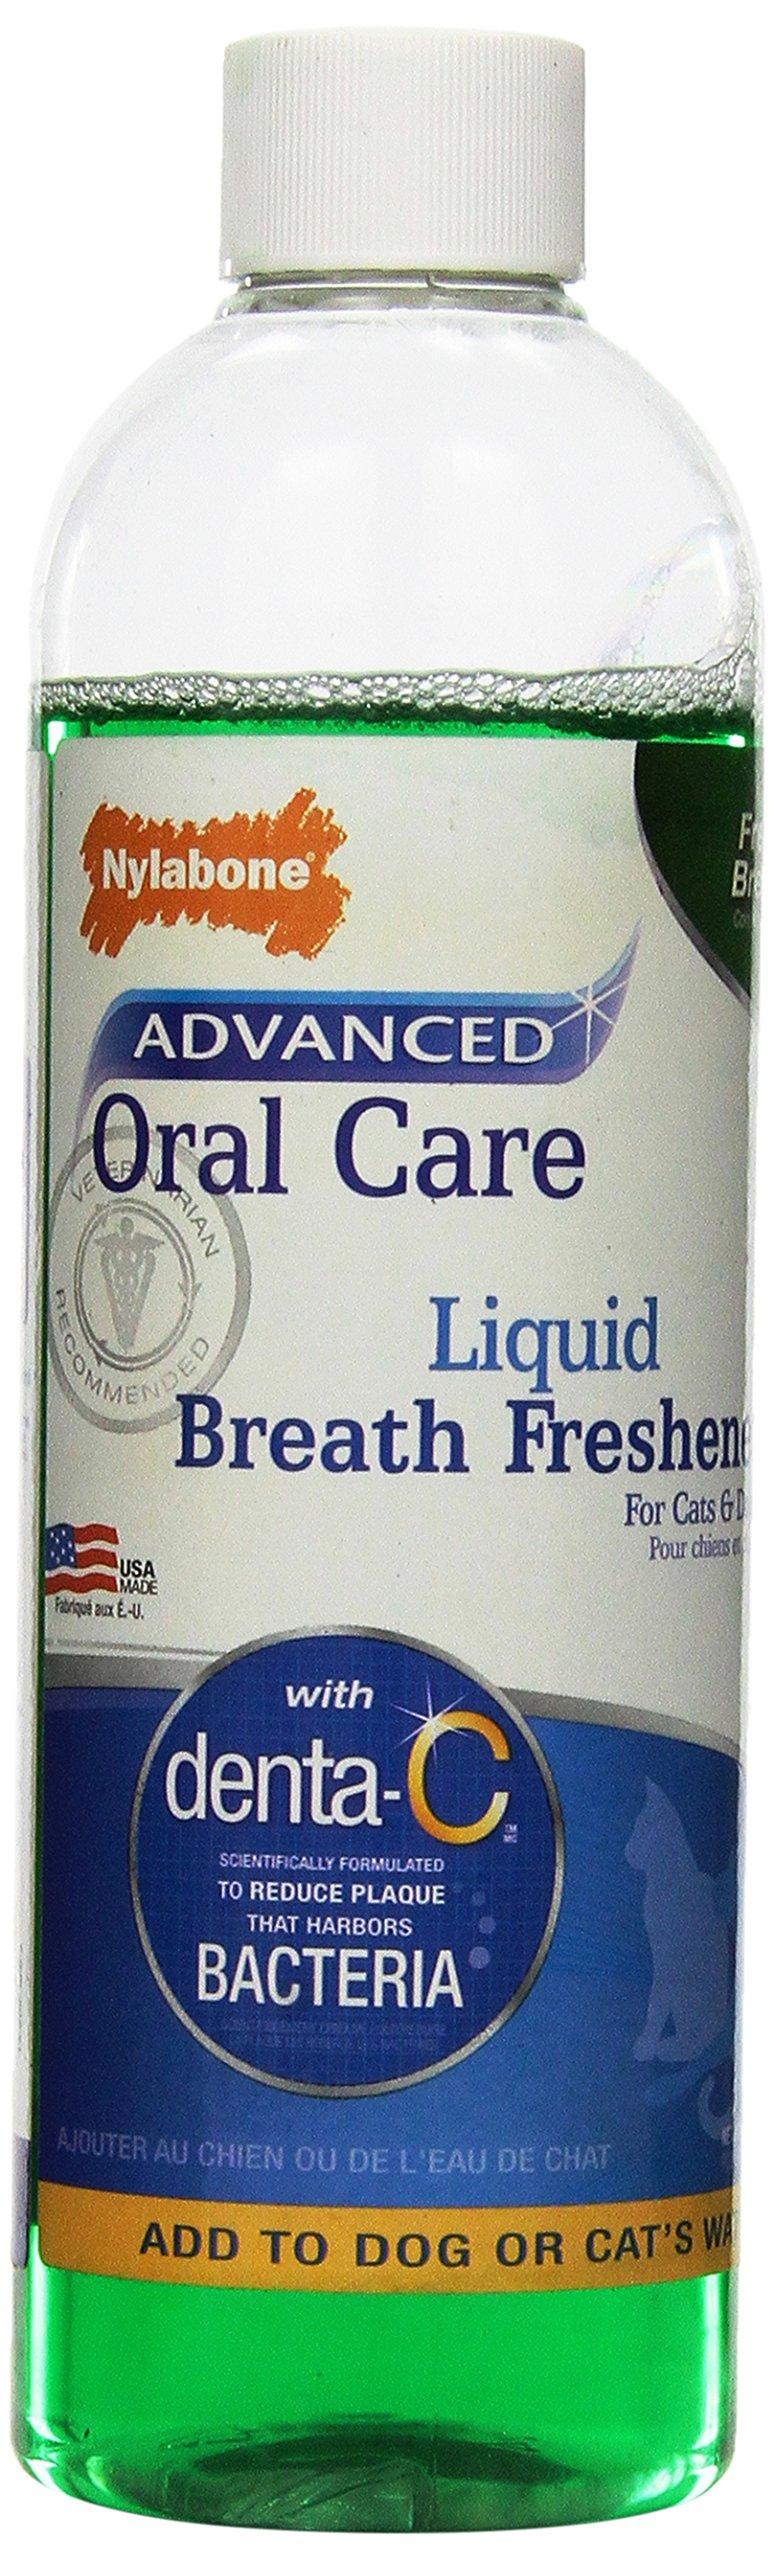 Nylabone Advanced Oral Care Liquid Breath Freshener, 16-Ounce